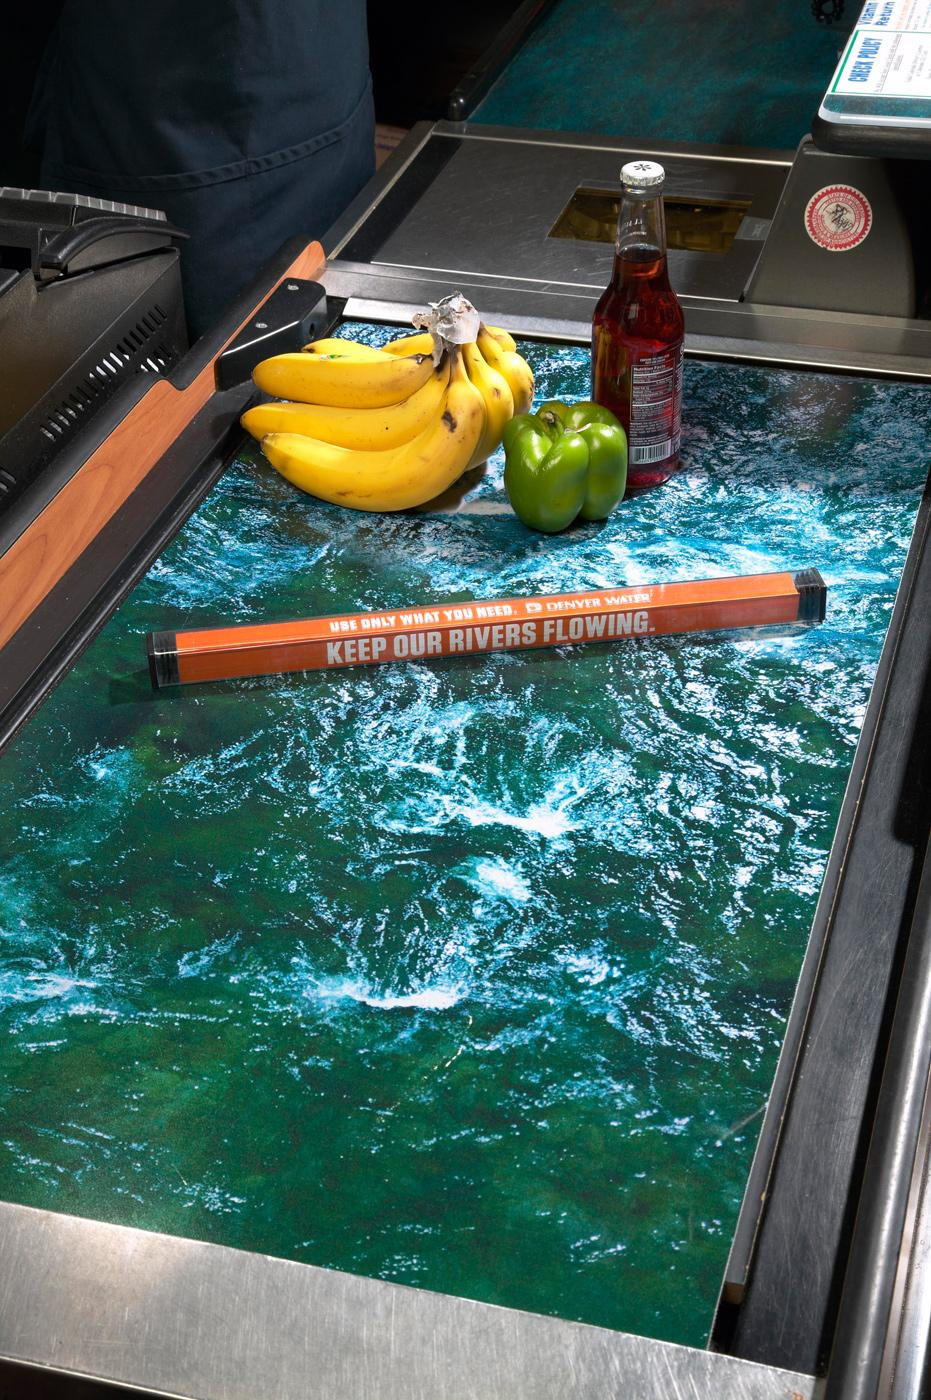 Denver Water Ambient Ad -  Conveyor belt